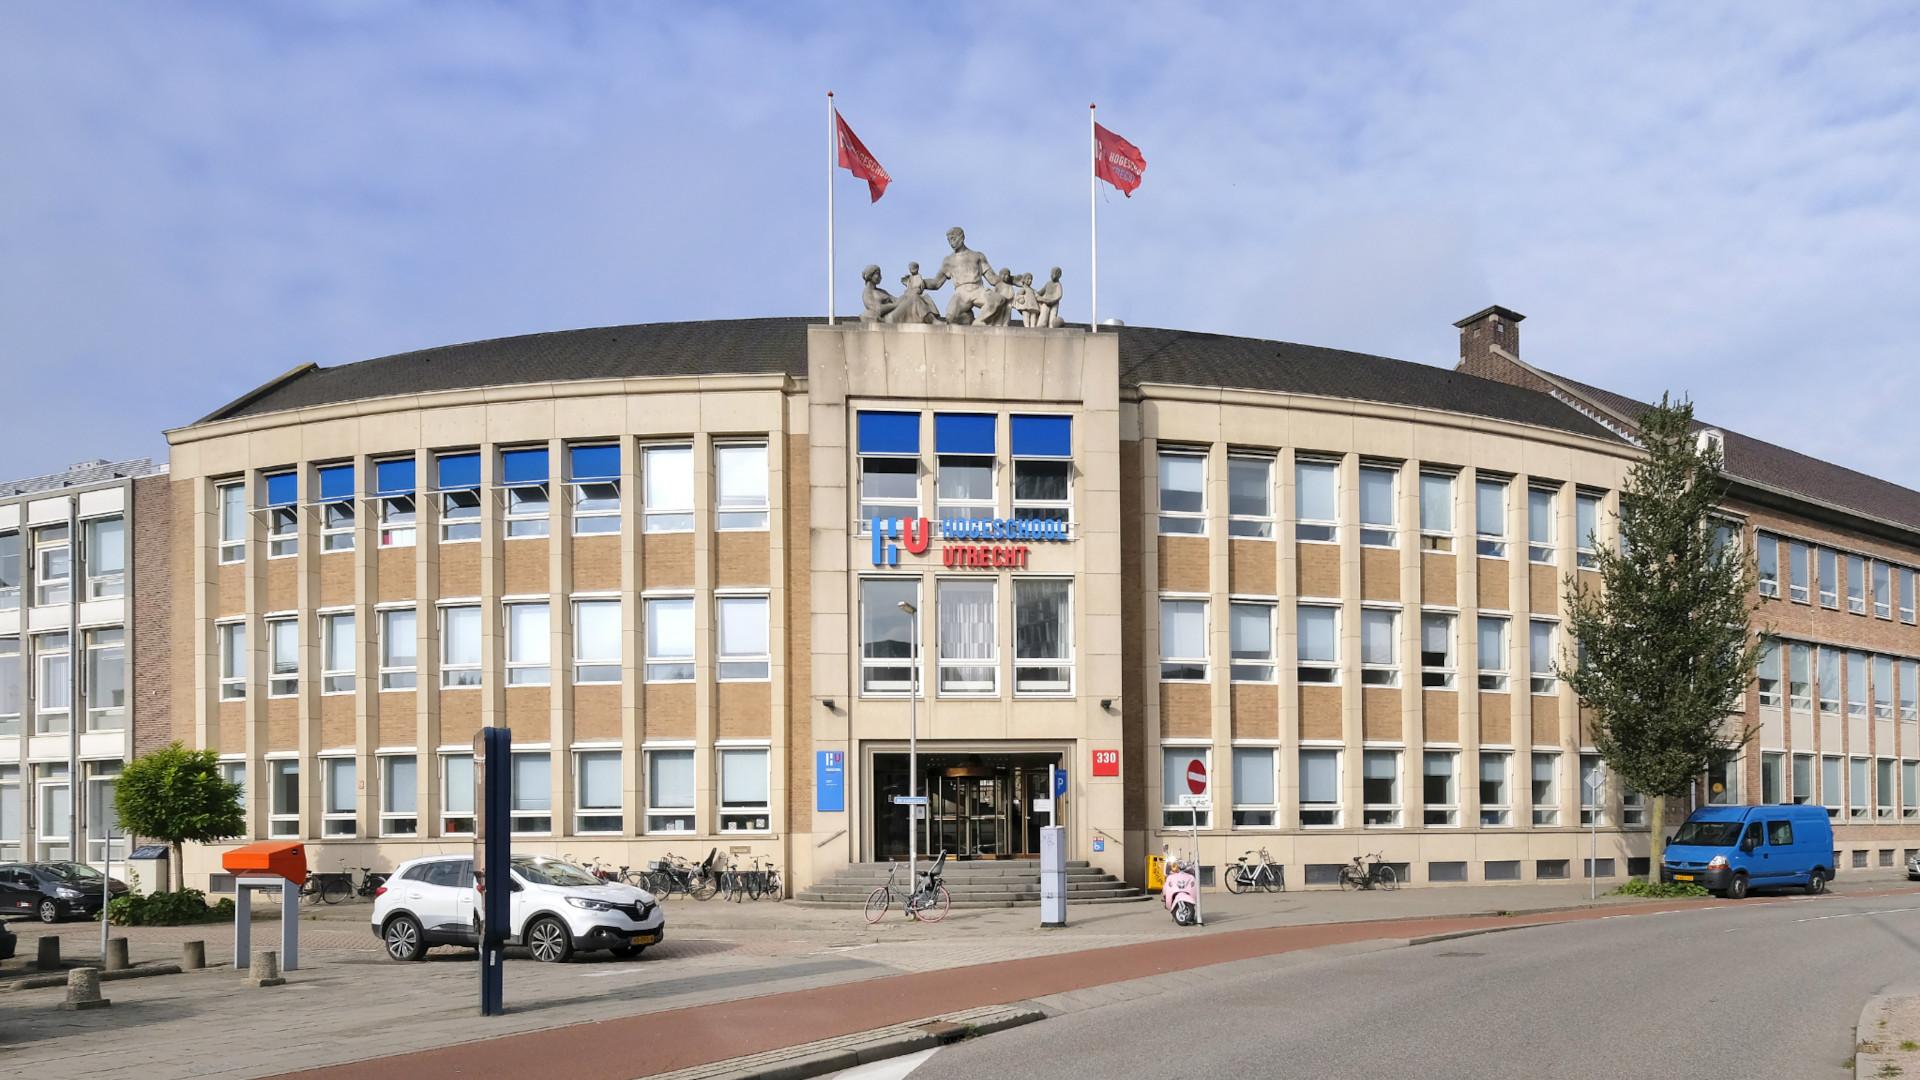 17047 Oudenoord Utrecht laserscanning.jpg